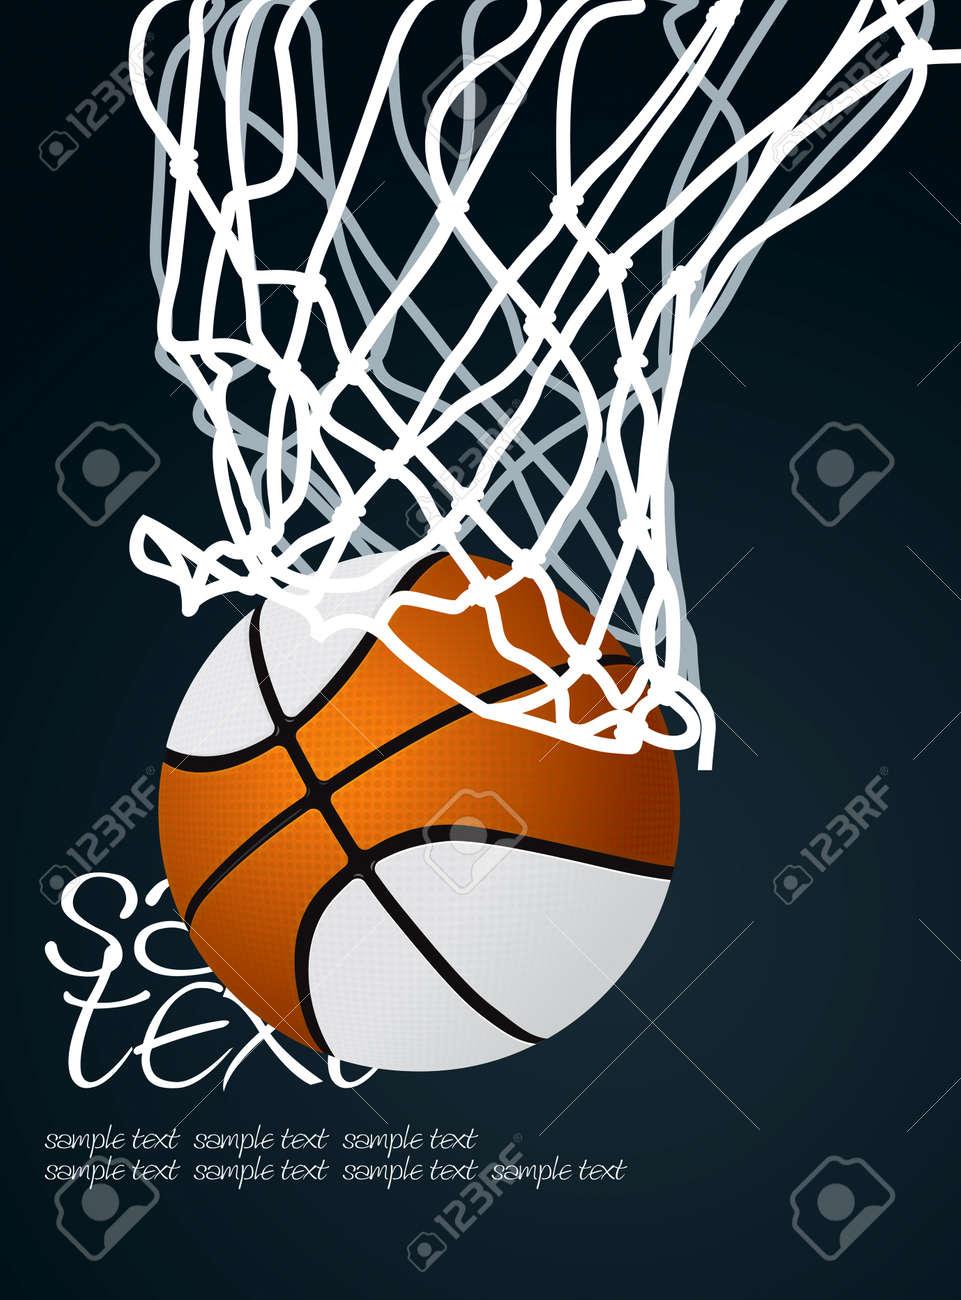 Basket 3 Vector Drawing Stock Vector - 8558119